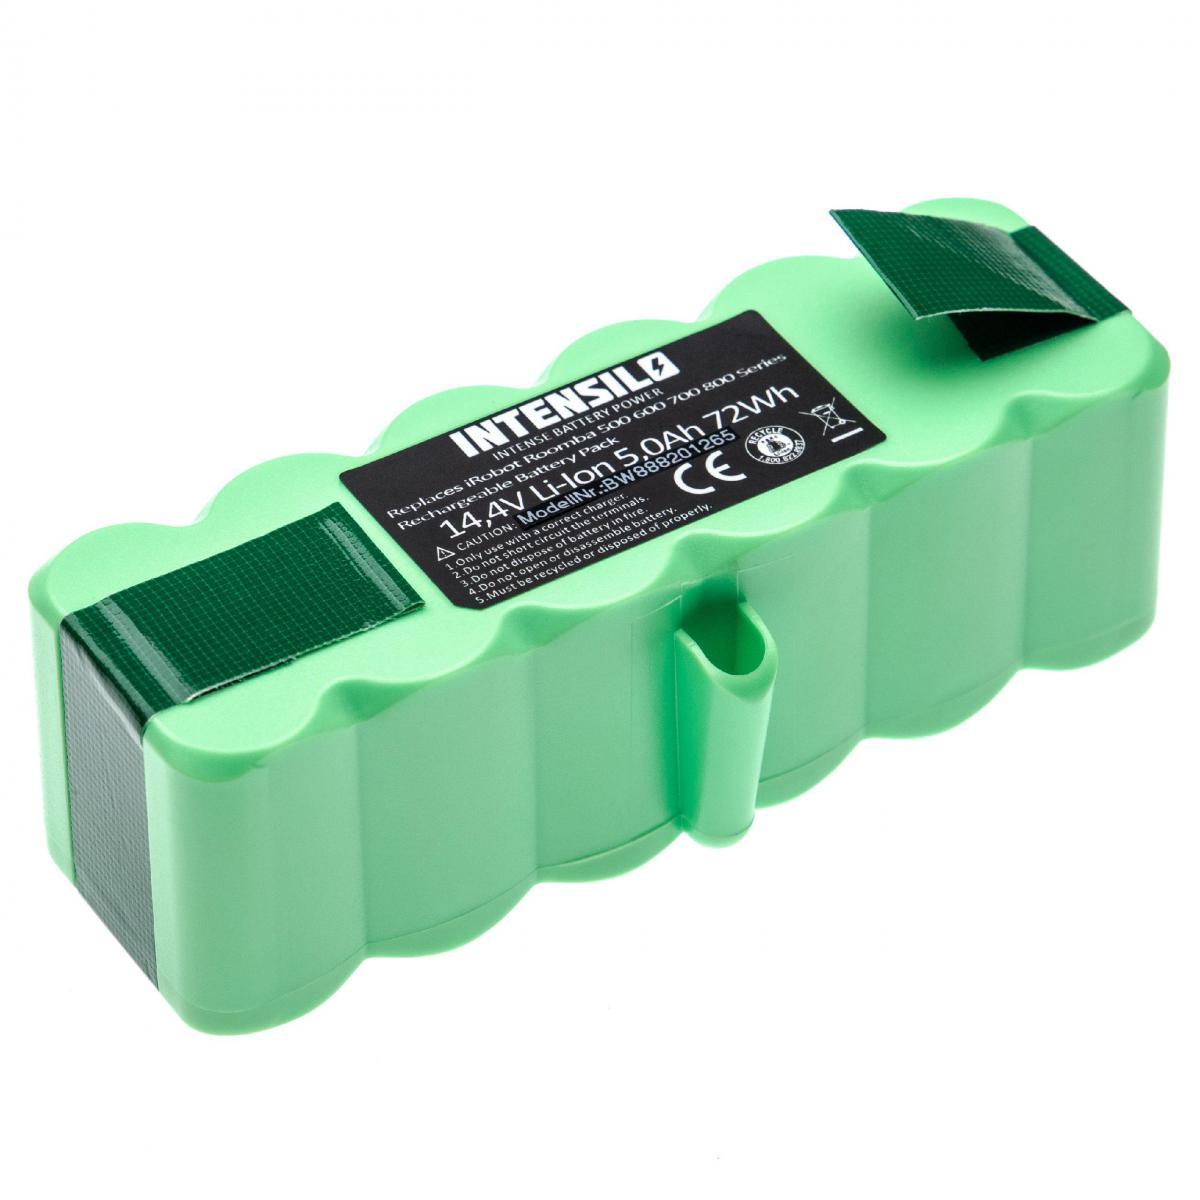 Vhbw INTENSILO batterie compatible avec iRobot Roomba 614, 615, 640, 652, 665, 670, 671, 675 aspirateur Home Cleaner (5000mAh